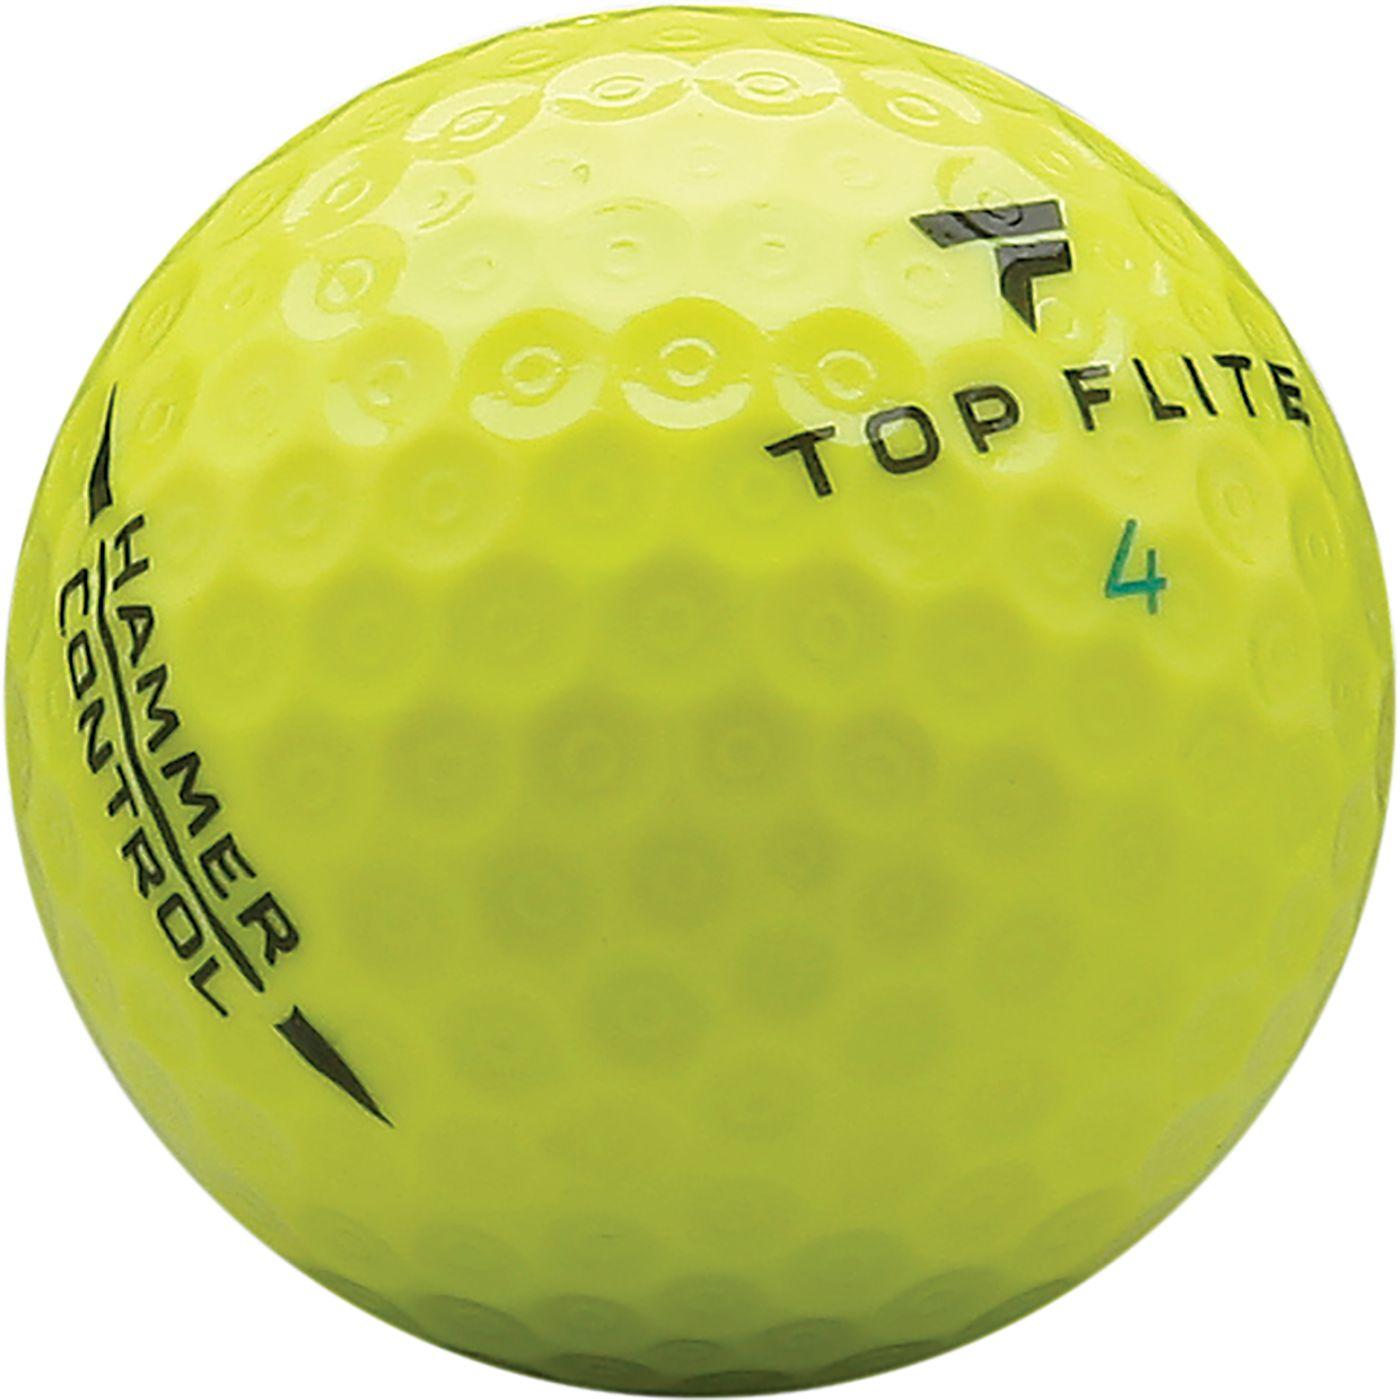 Top Flite 2020 Hammer Control Yellow Golf Balls – 15 Pack